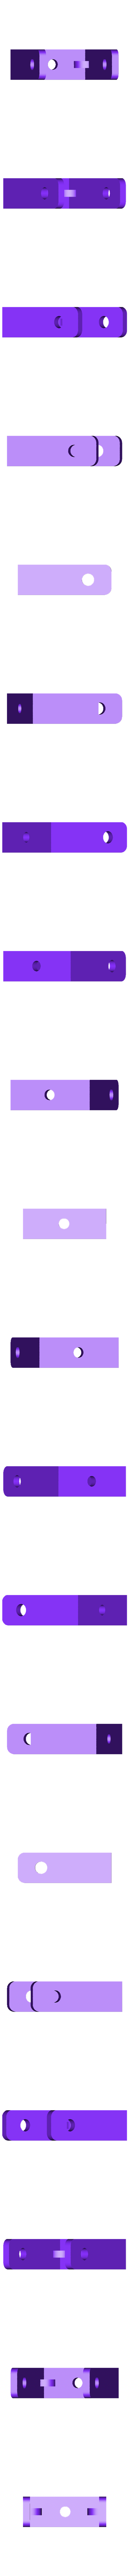 u-bracket-from-mox.stl Download free STL file Raspberry Pi Print Bed Mount. • 3D printer object, DonaldSayers